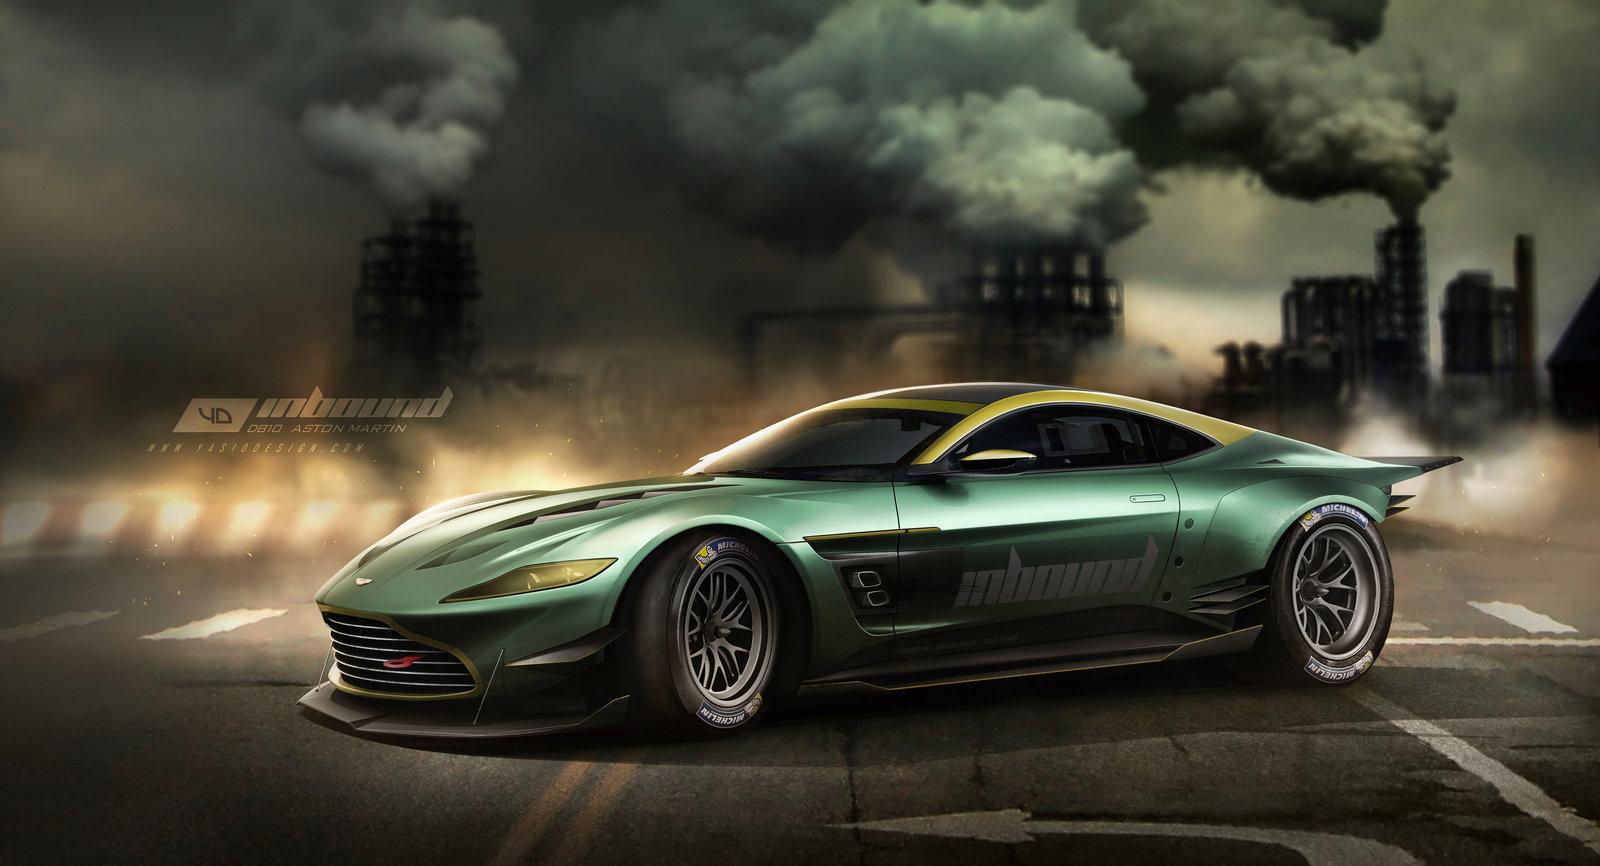 DB 10 Aston Martin